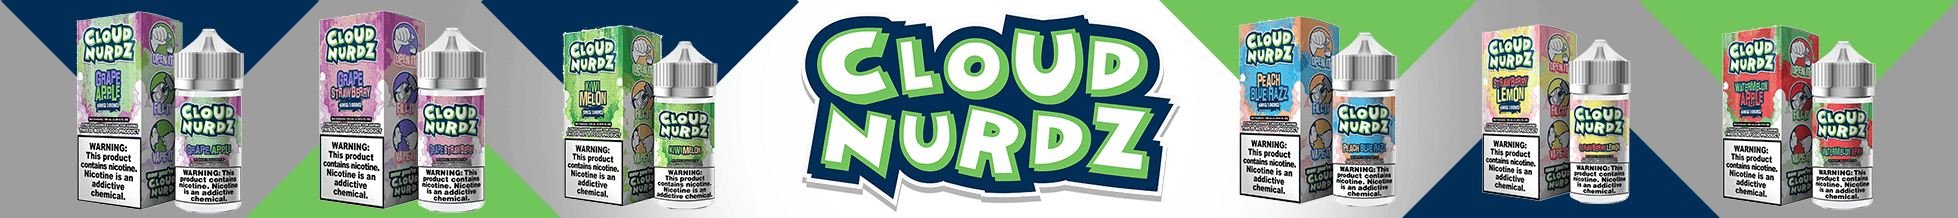 cloud-nurdz.png